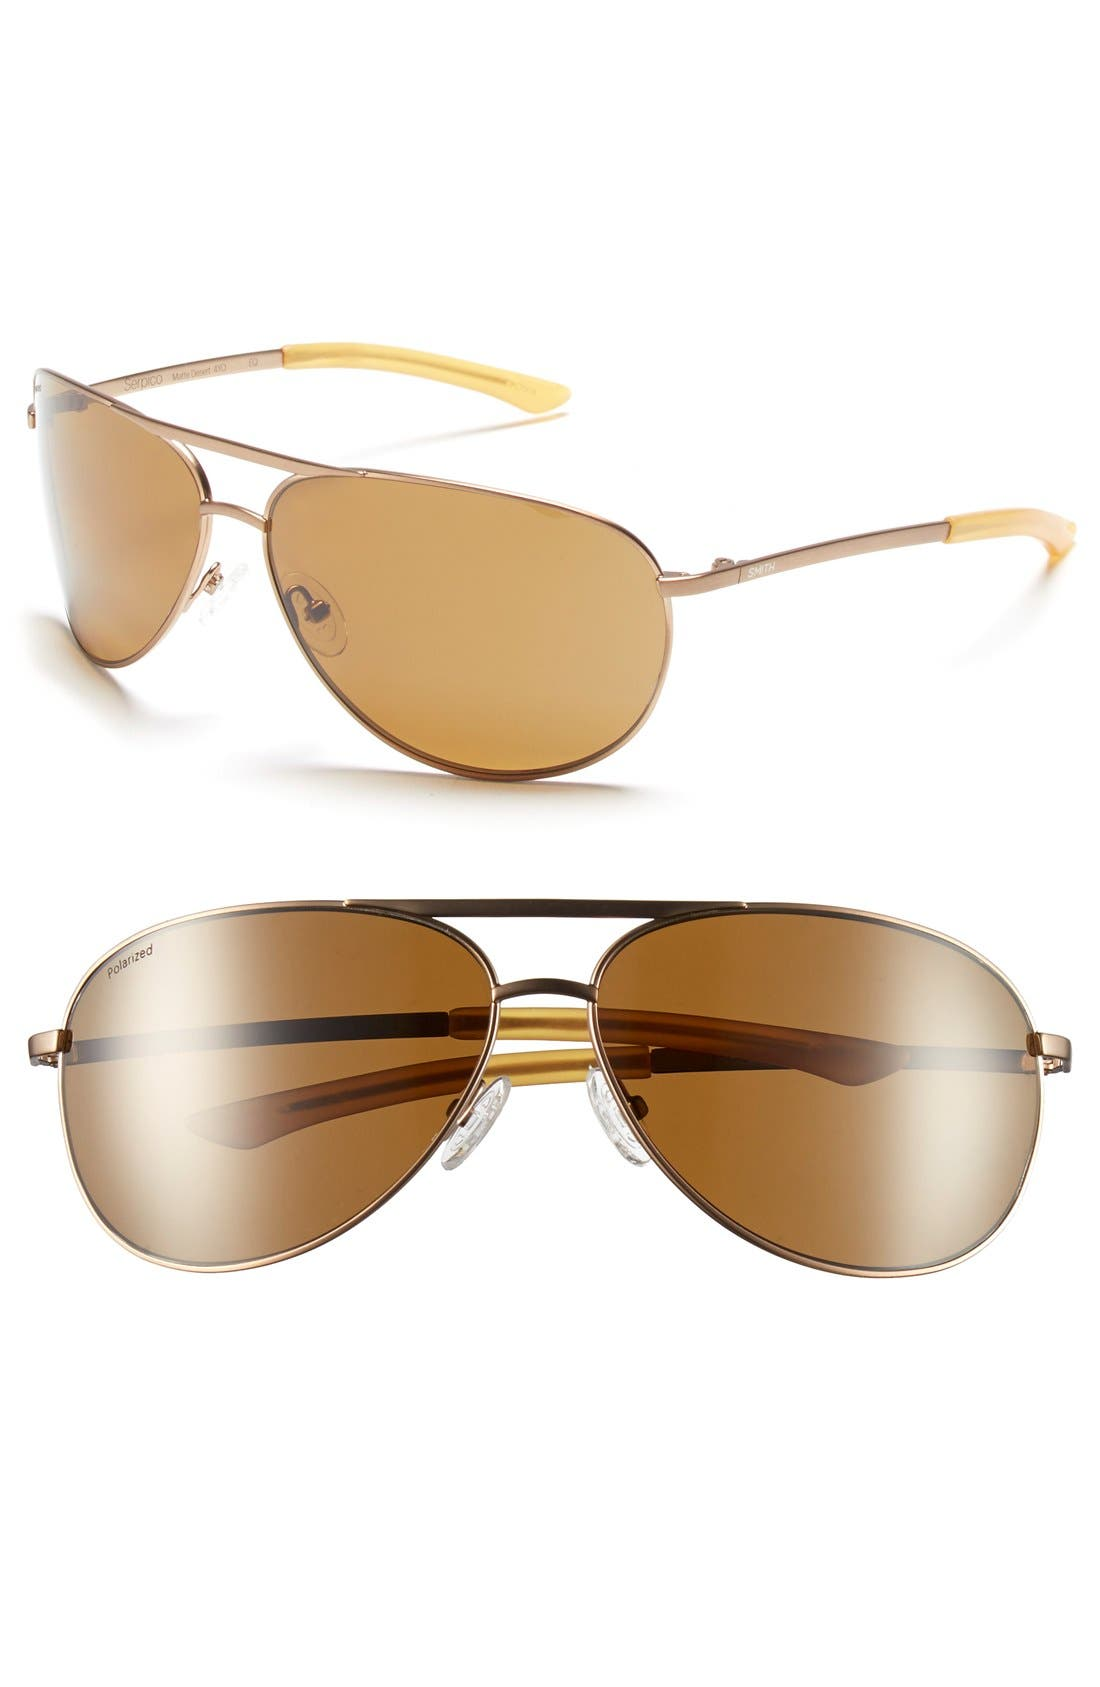 Alternate Image 1 Selected - Smith Optics 'Serpico' 66mm Polarized Sunglasses